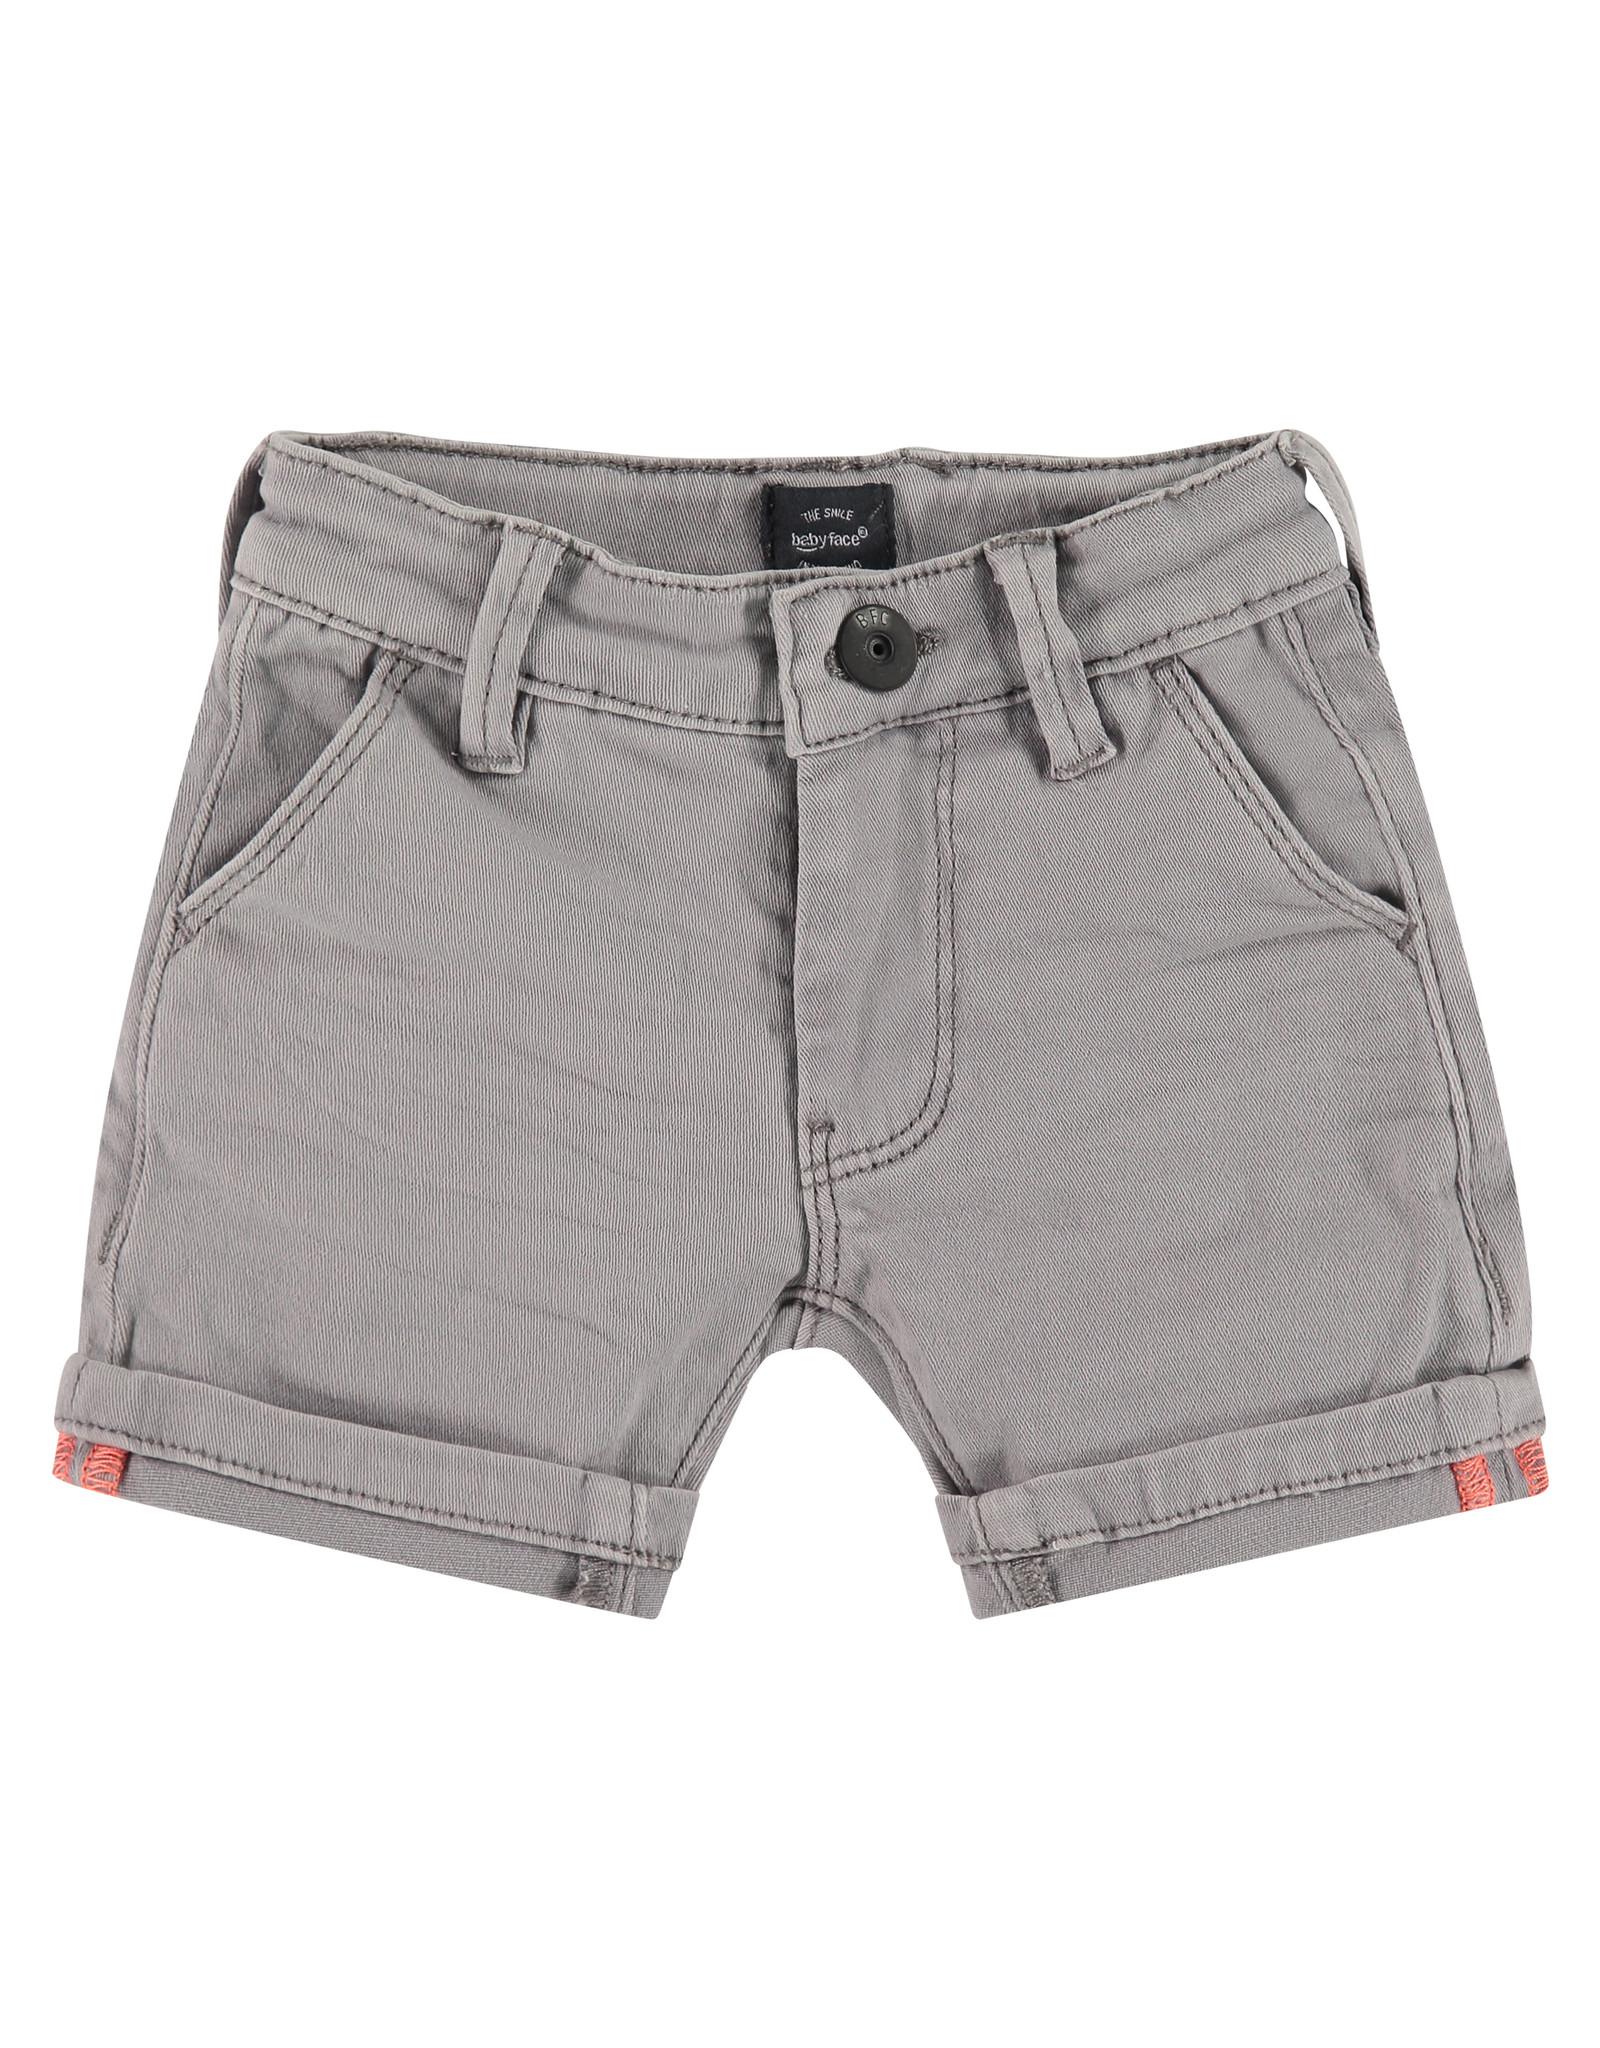 Babyface boys short, light grey, BBE21107235